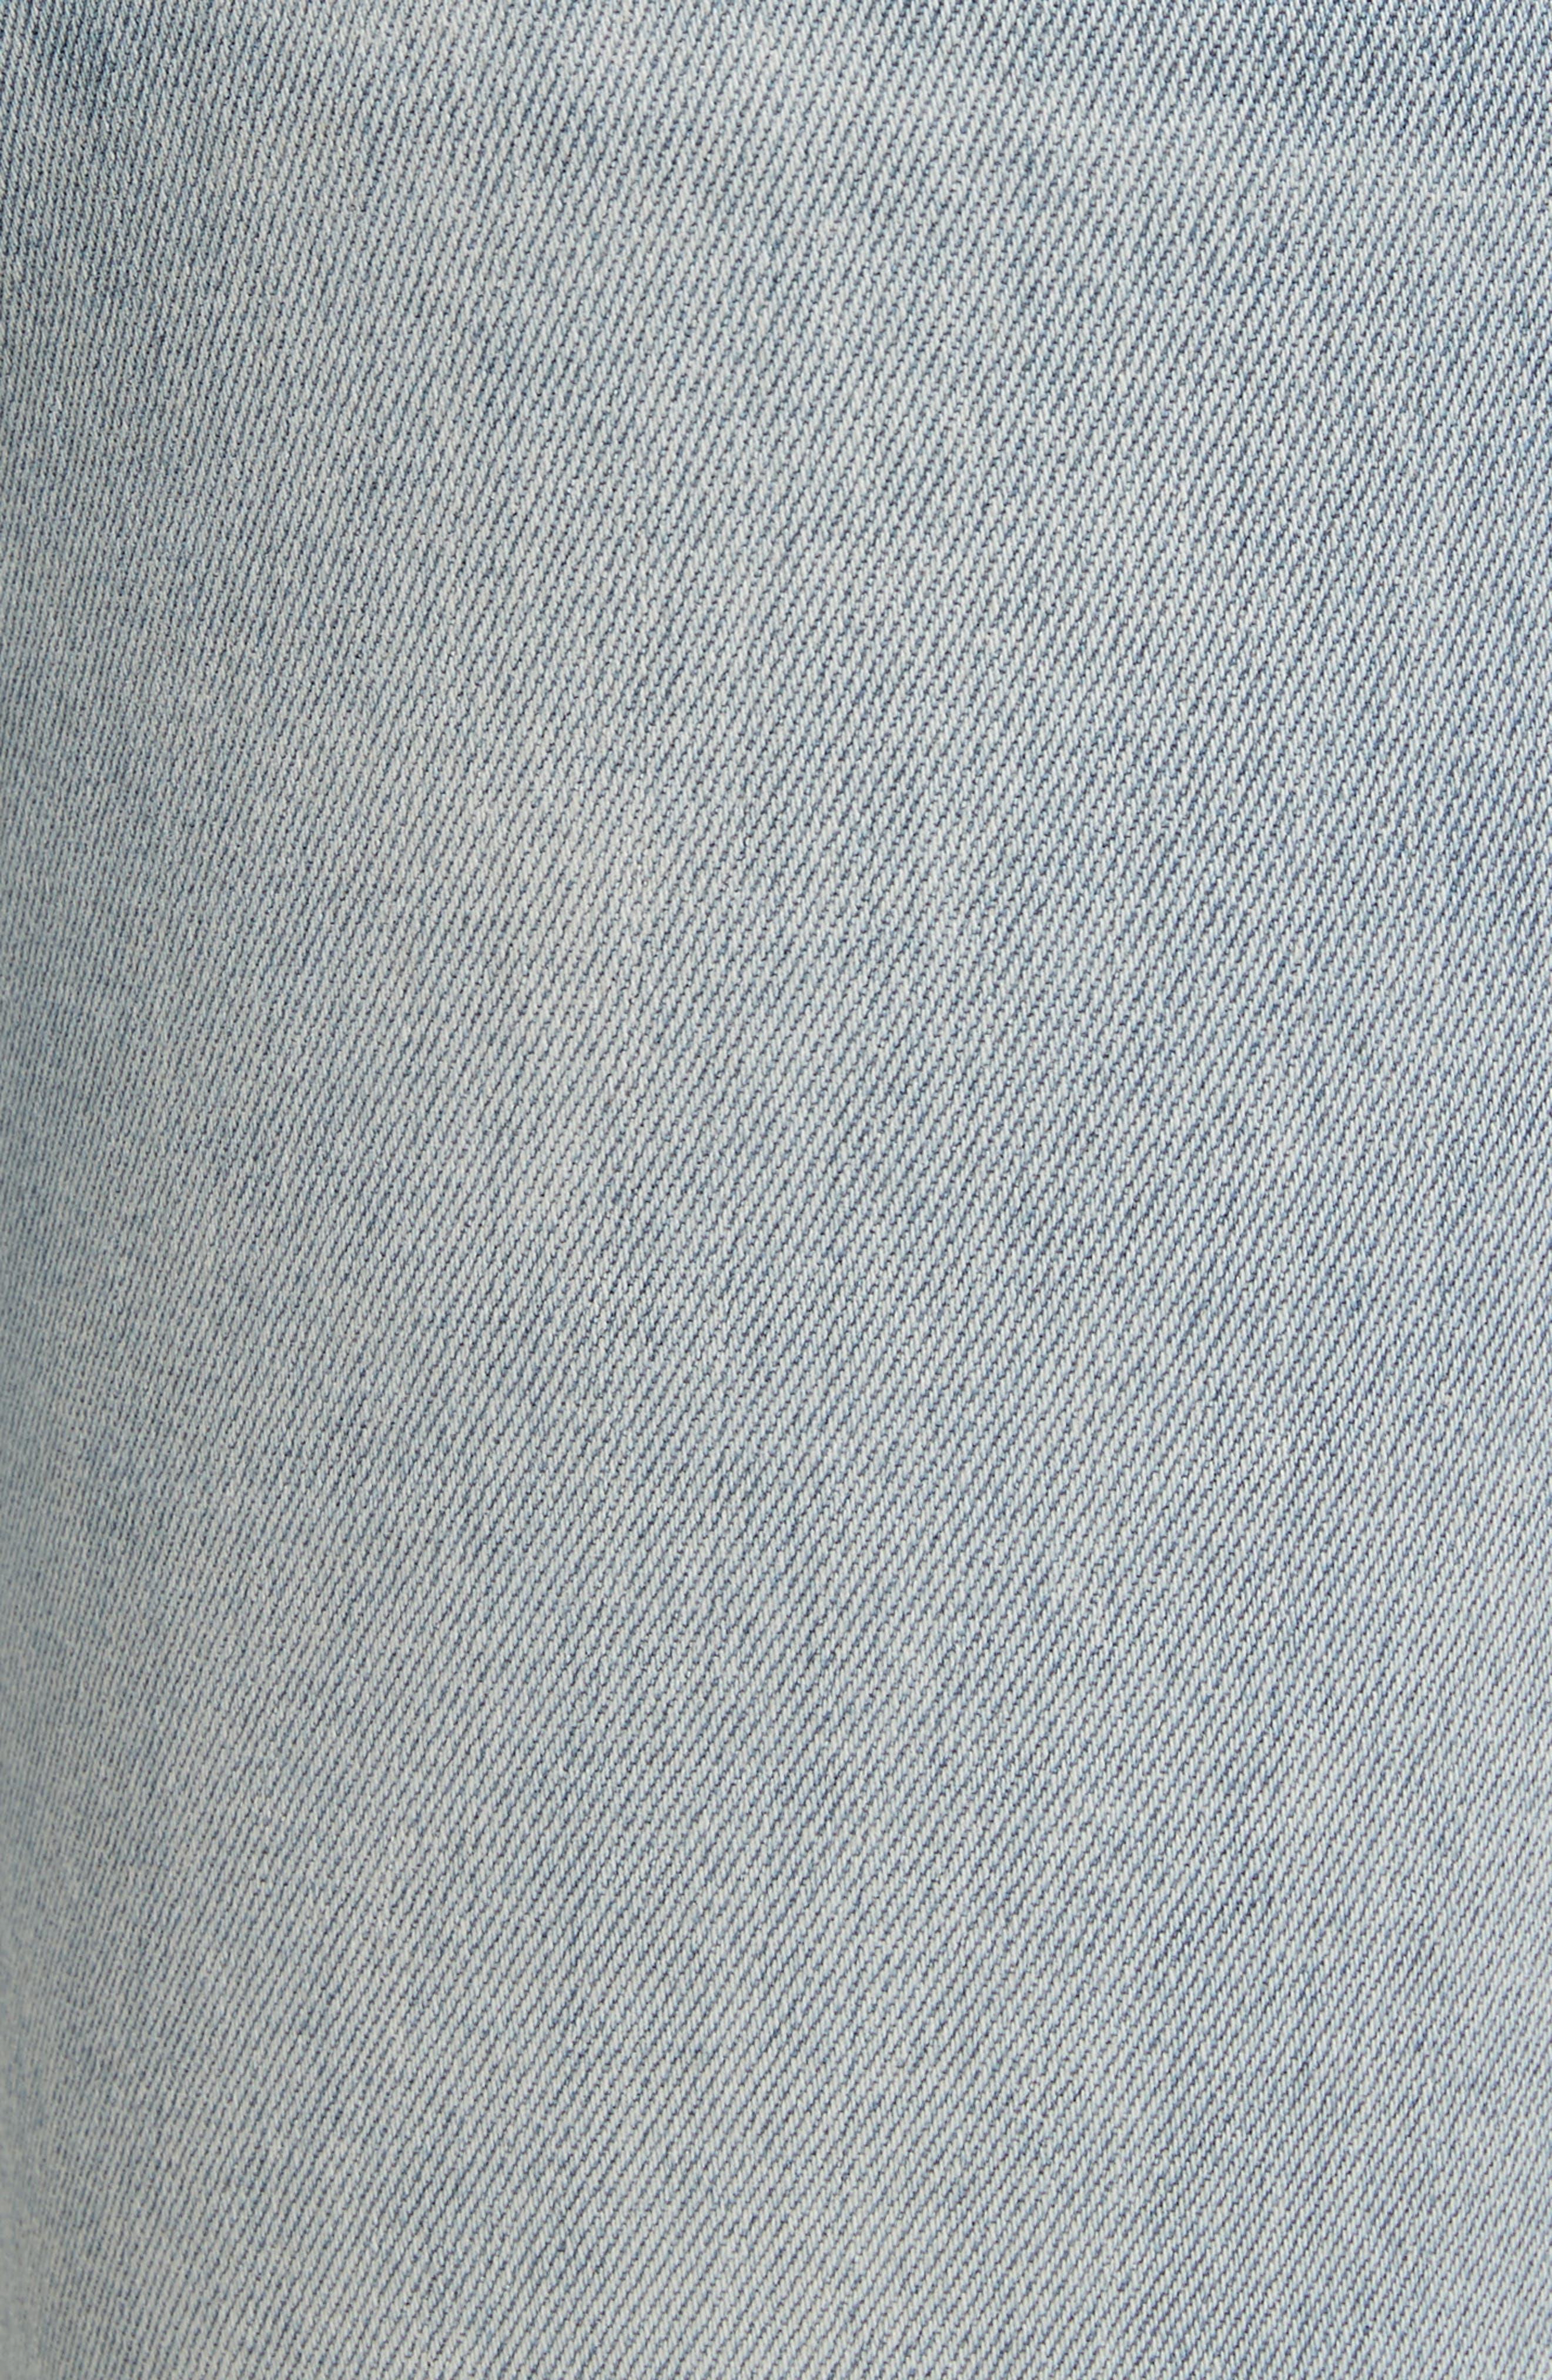 Deacon Skate Skinny Fit Jeans,                             Alternate thumbnail 5, color,                             400